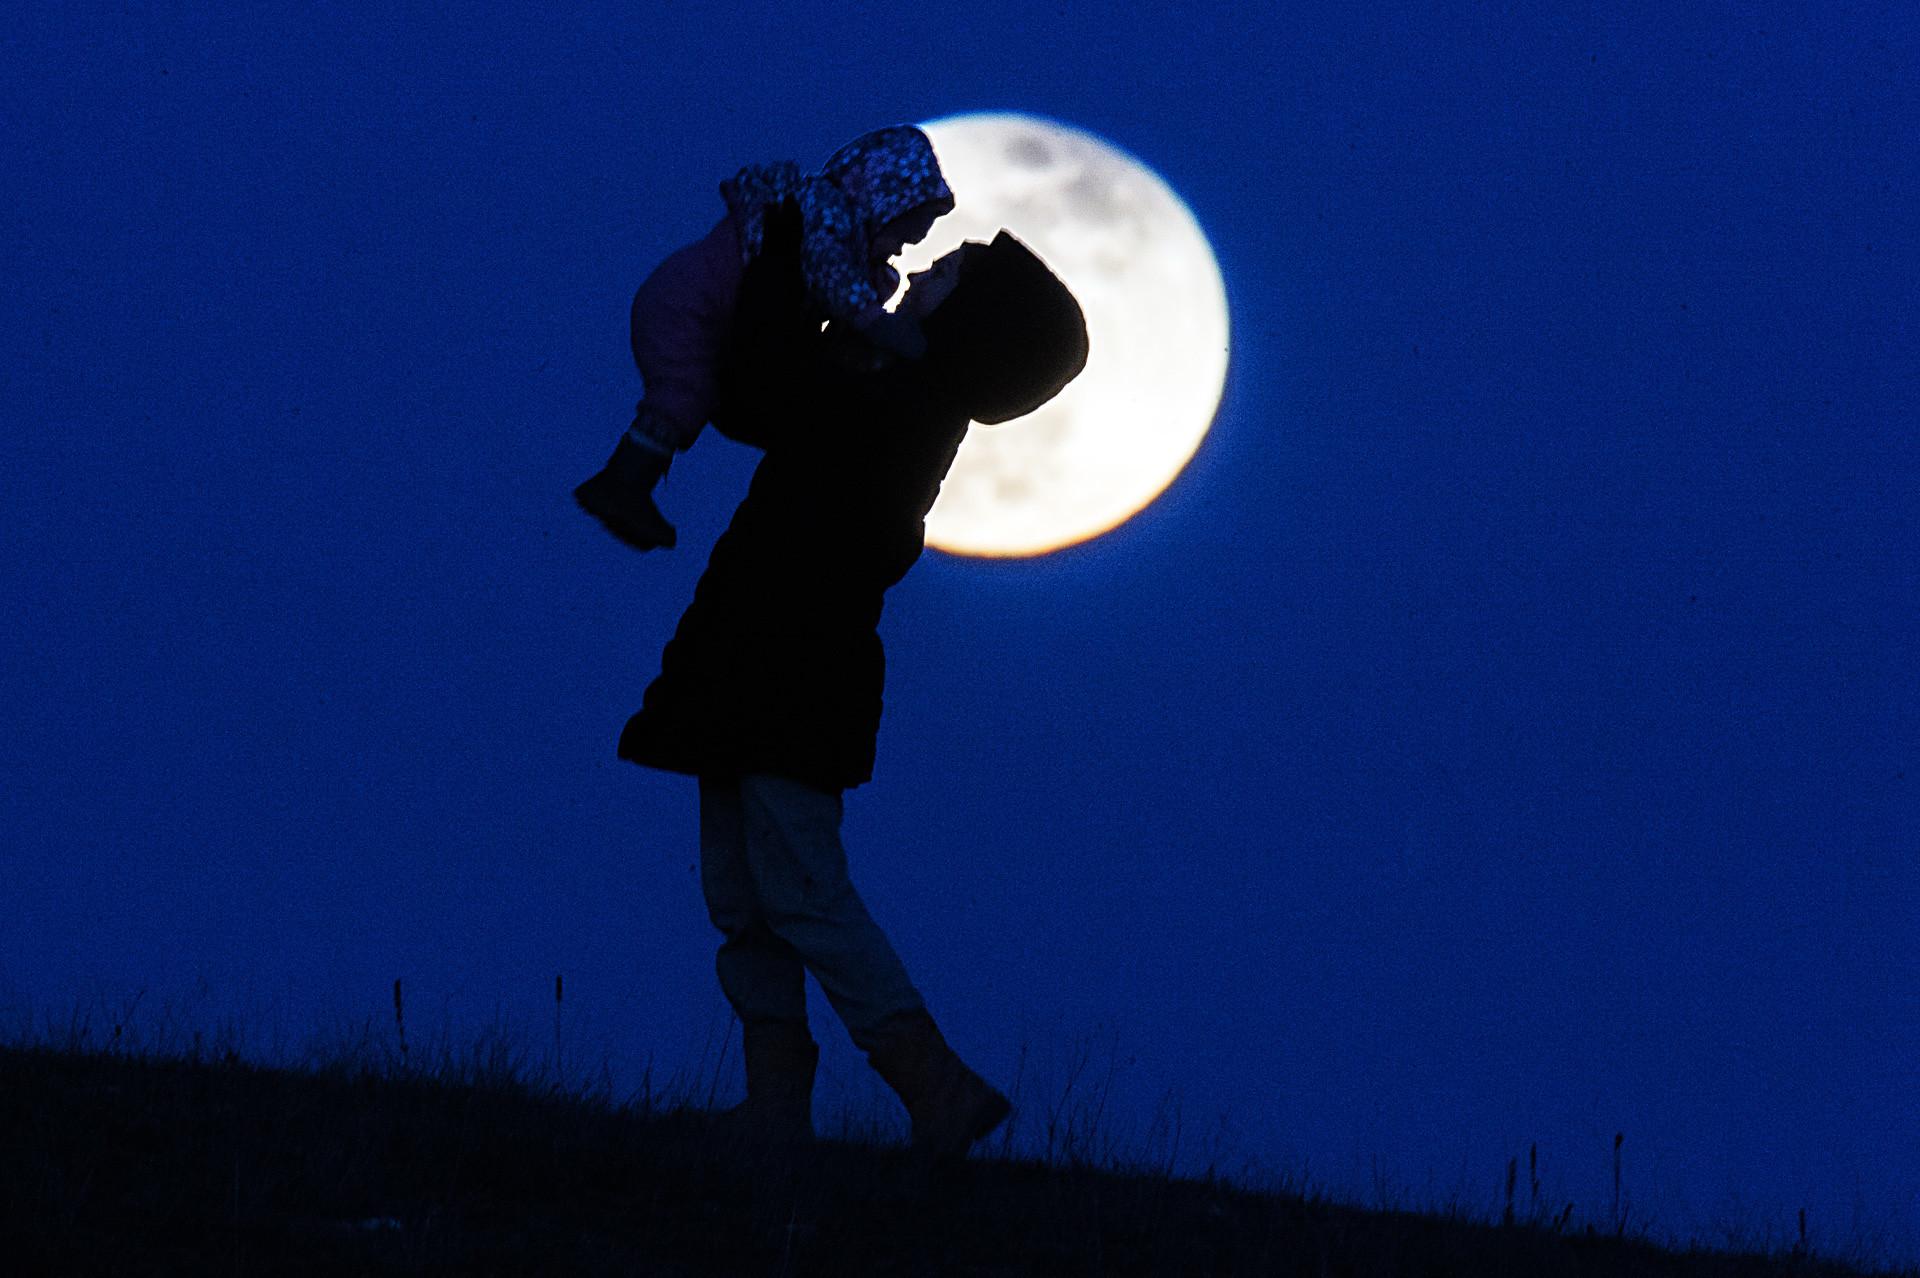 Seorang ibu membawa anaknya berjalan-jalan malam hari di kota Simferopol.